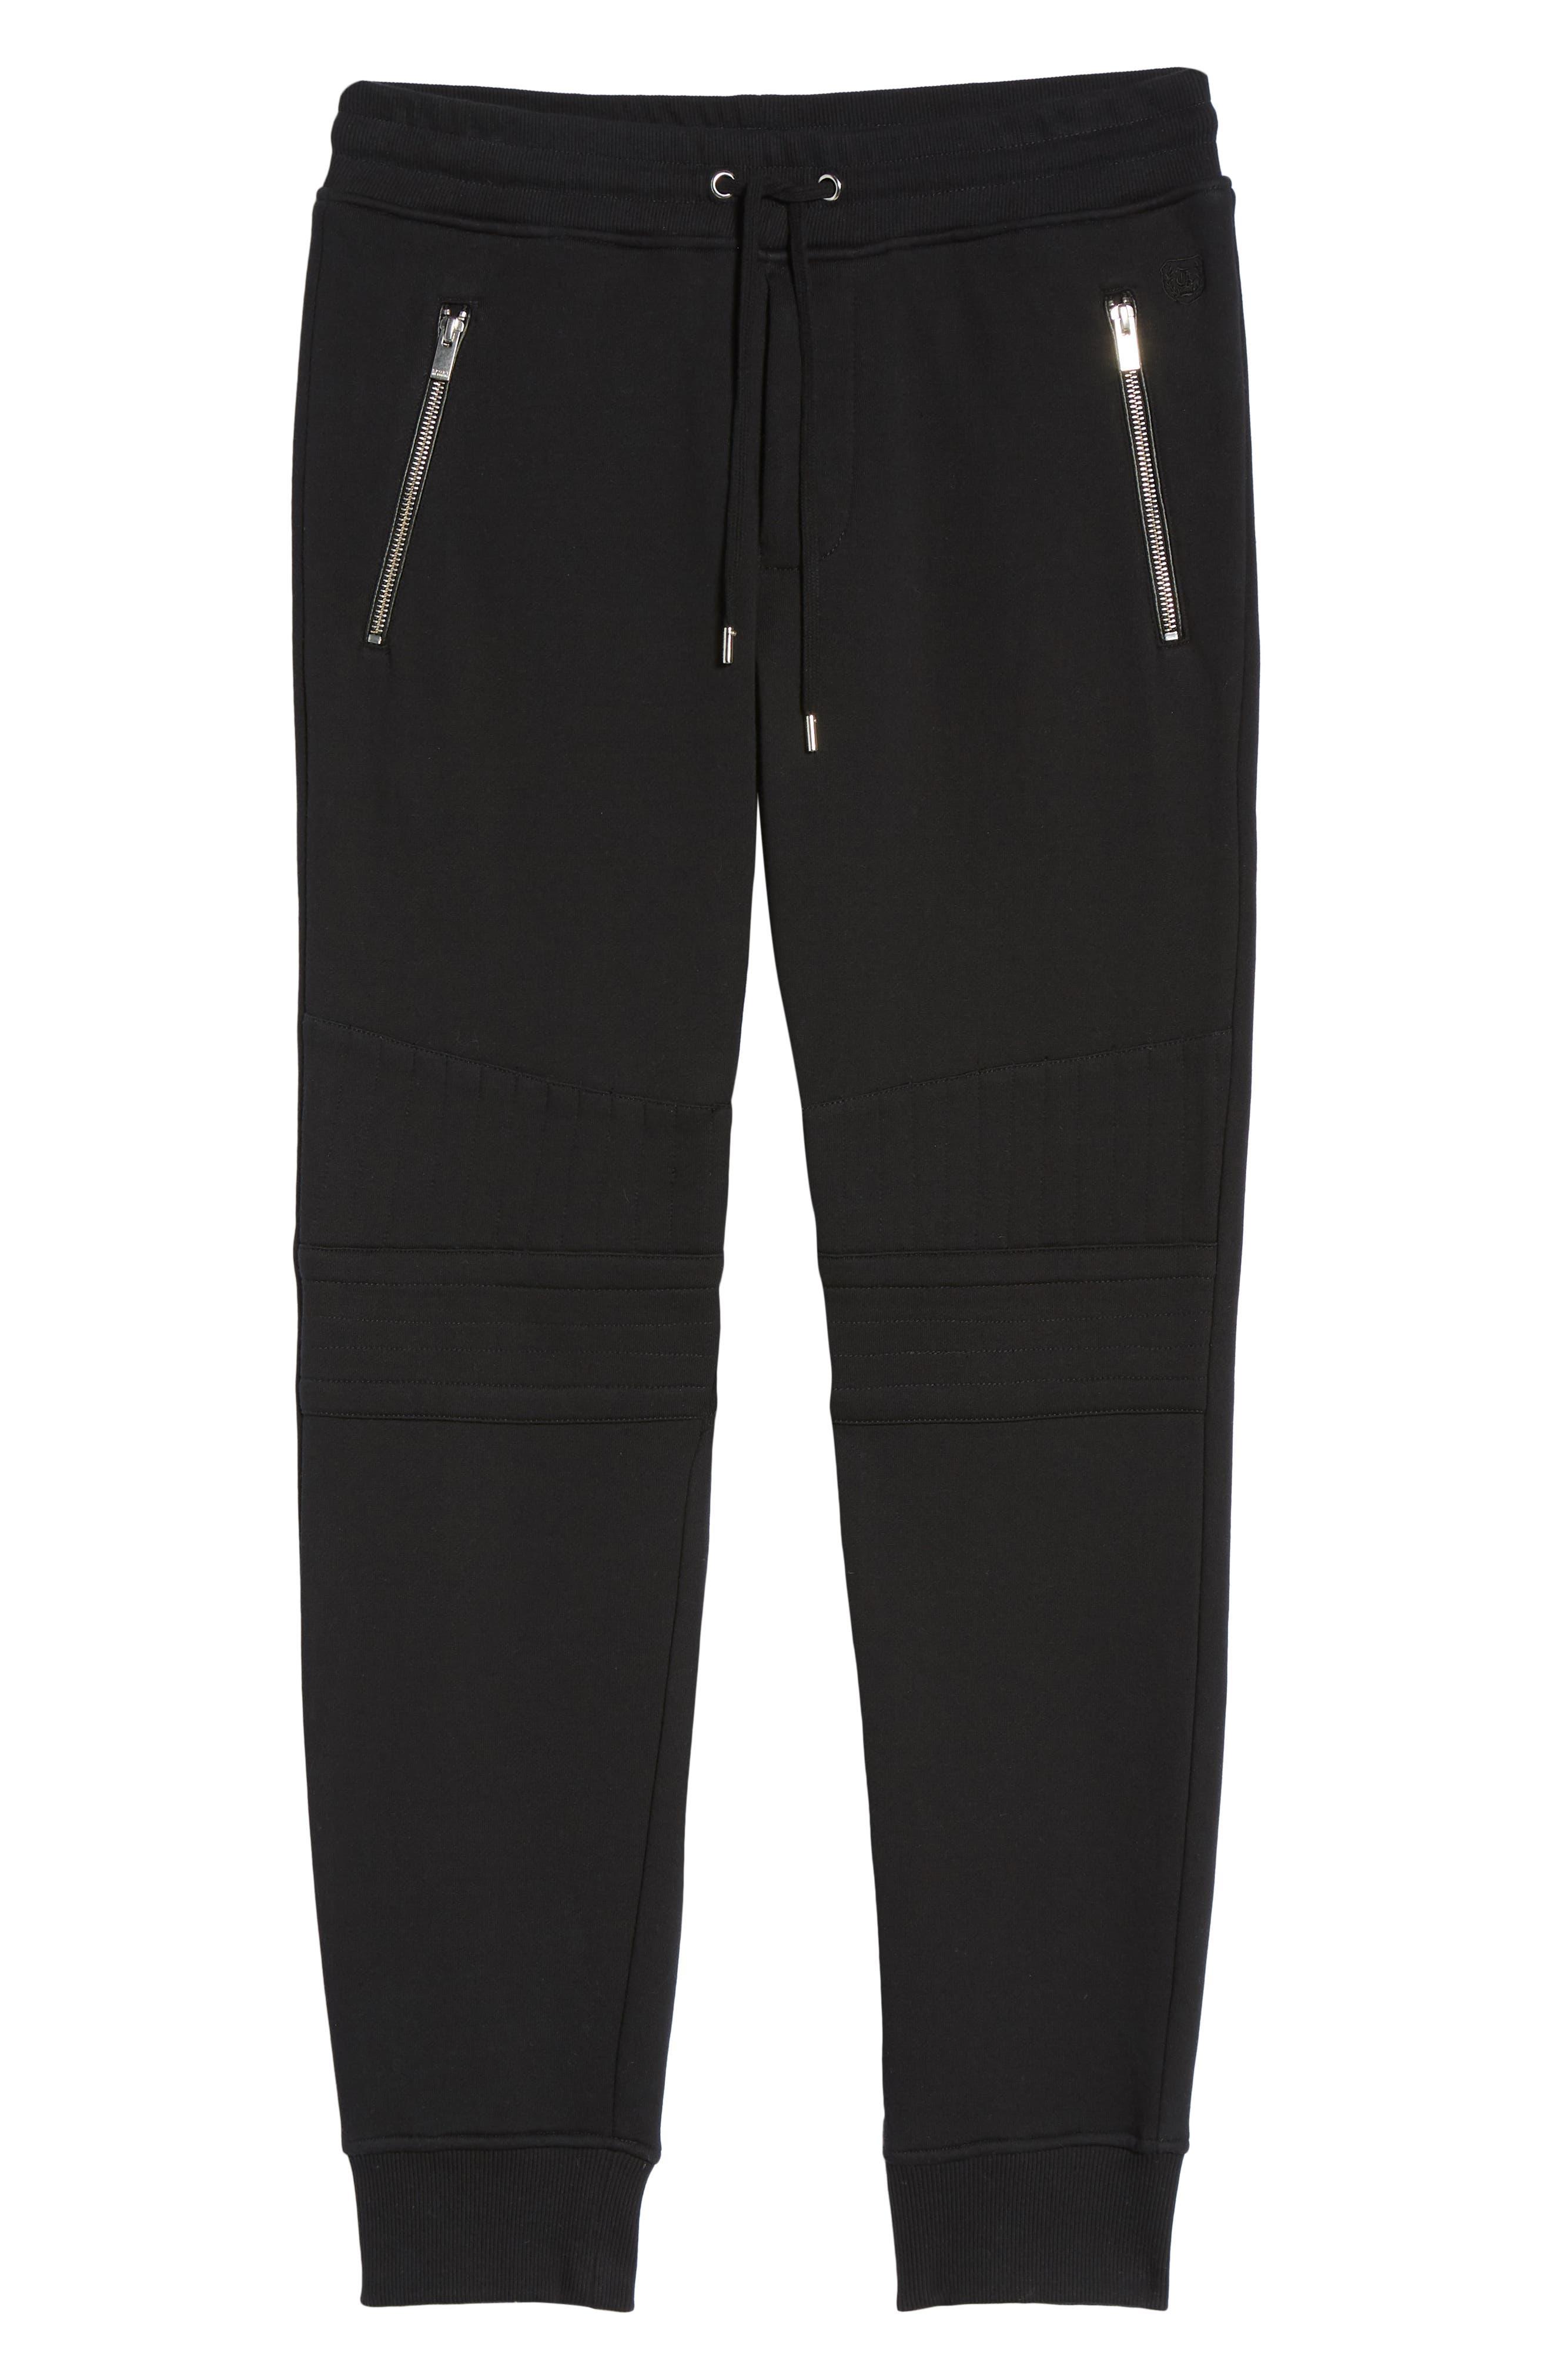 Classic Slim Fit Fleece Joggers,                             Alternate thumbnail 6, color,                             BLACK BLA01